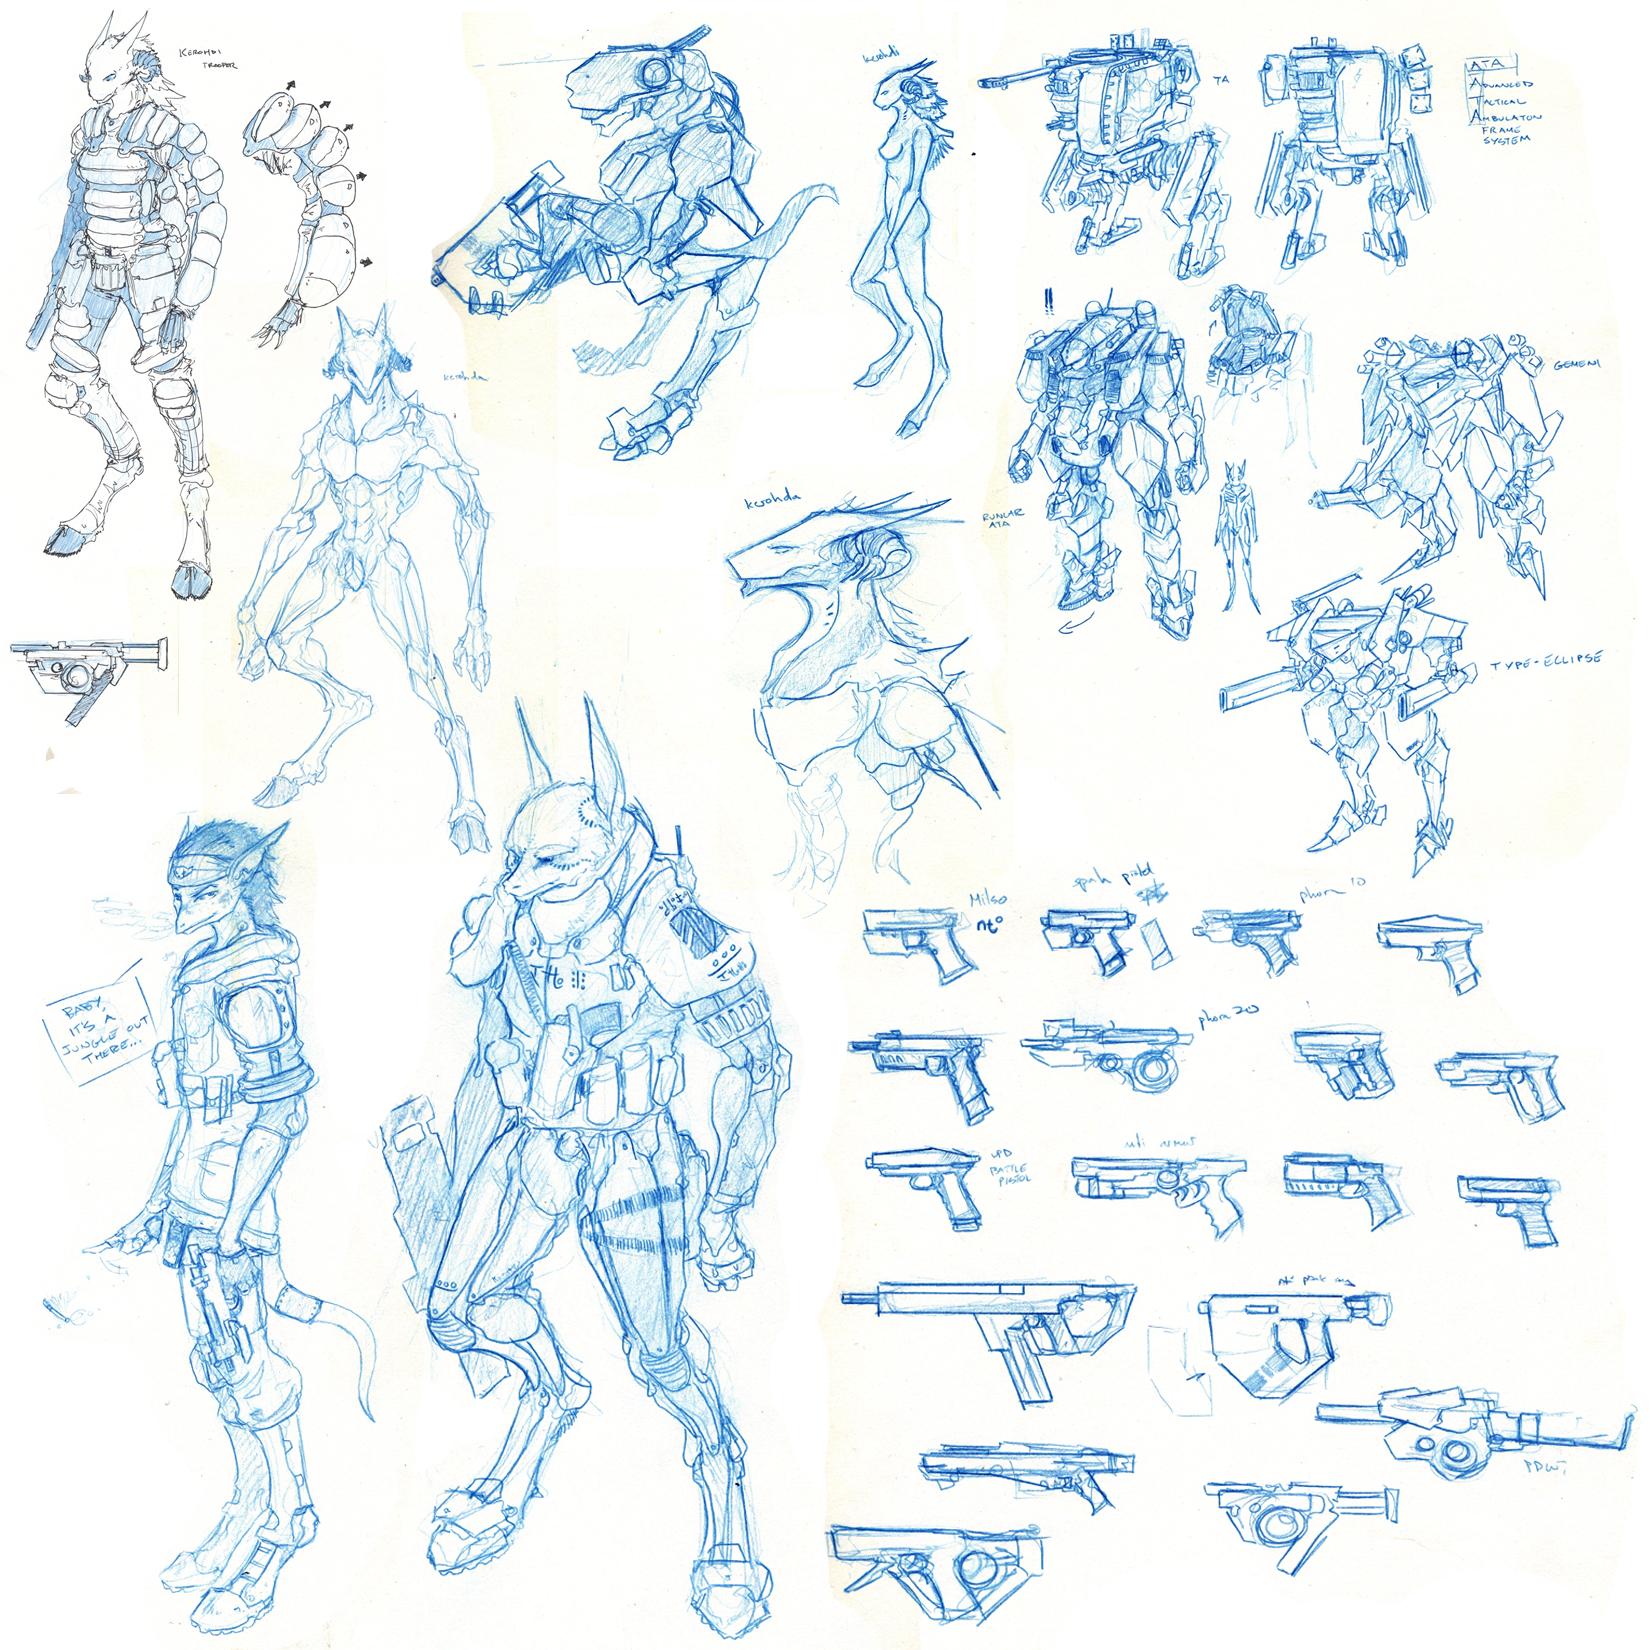 Giant Sketch Dump III by Zaeta-K